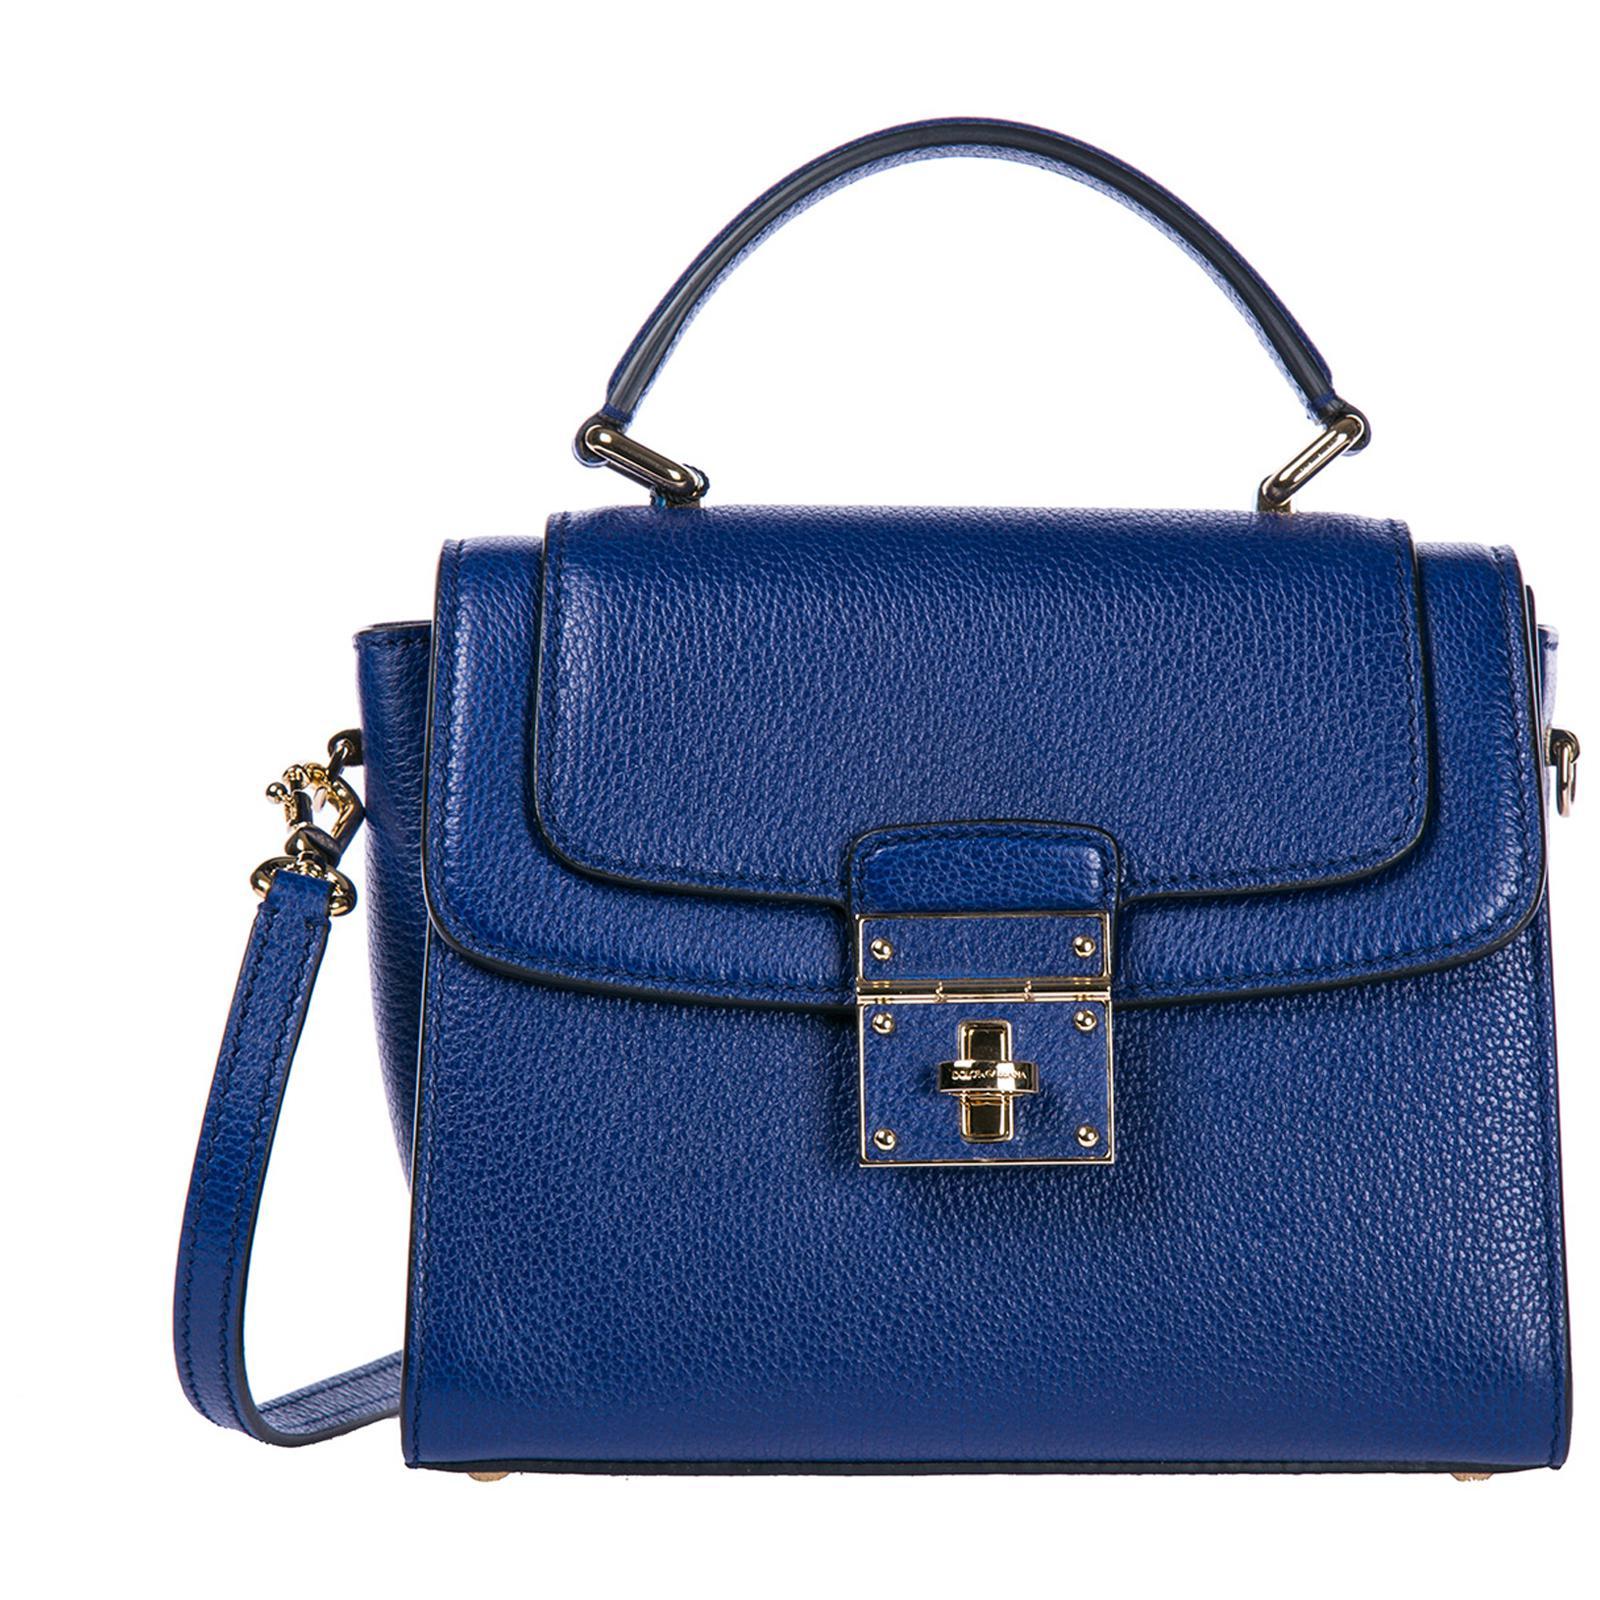 92031674cb8c Dolce   Gabbana Small Greta Tote Bag in Blue - Save 50% - Lyst